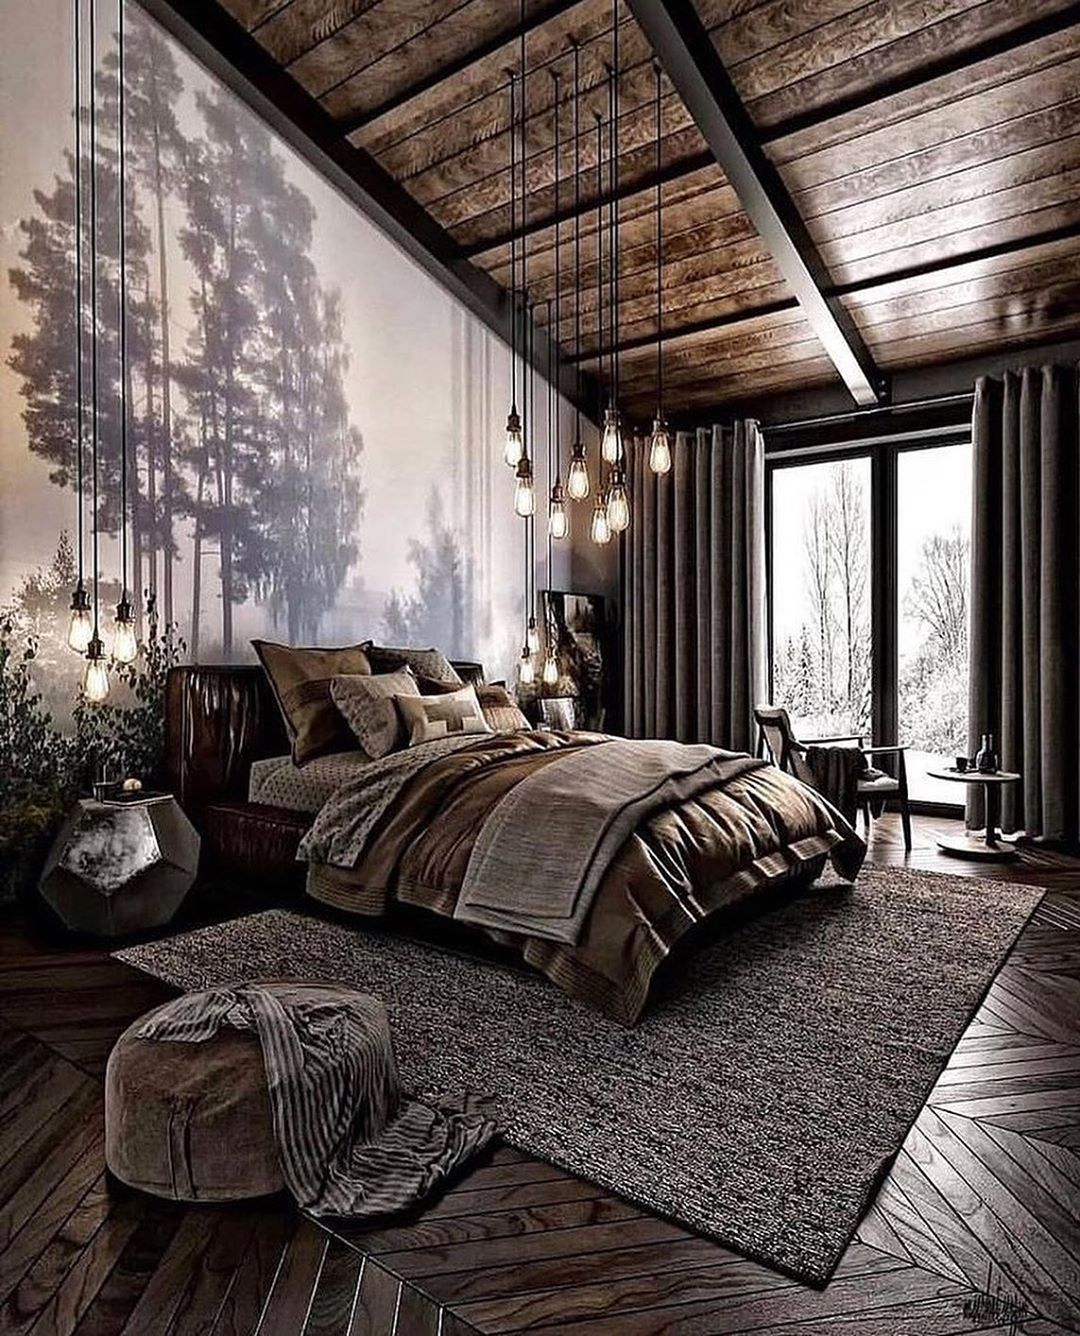 35+ Stunning Bedroom Design Ideas 2019 - Page 30 of 39 - My Blog